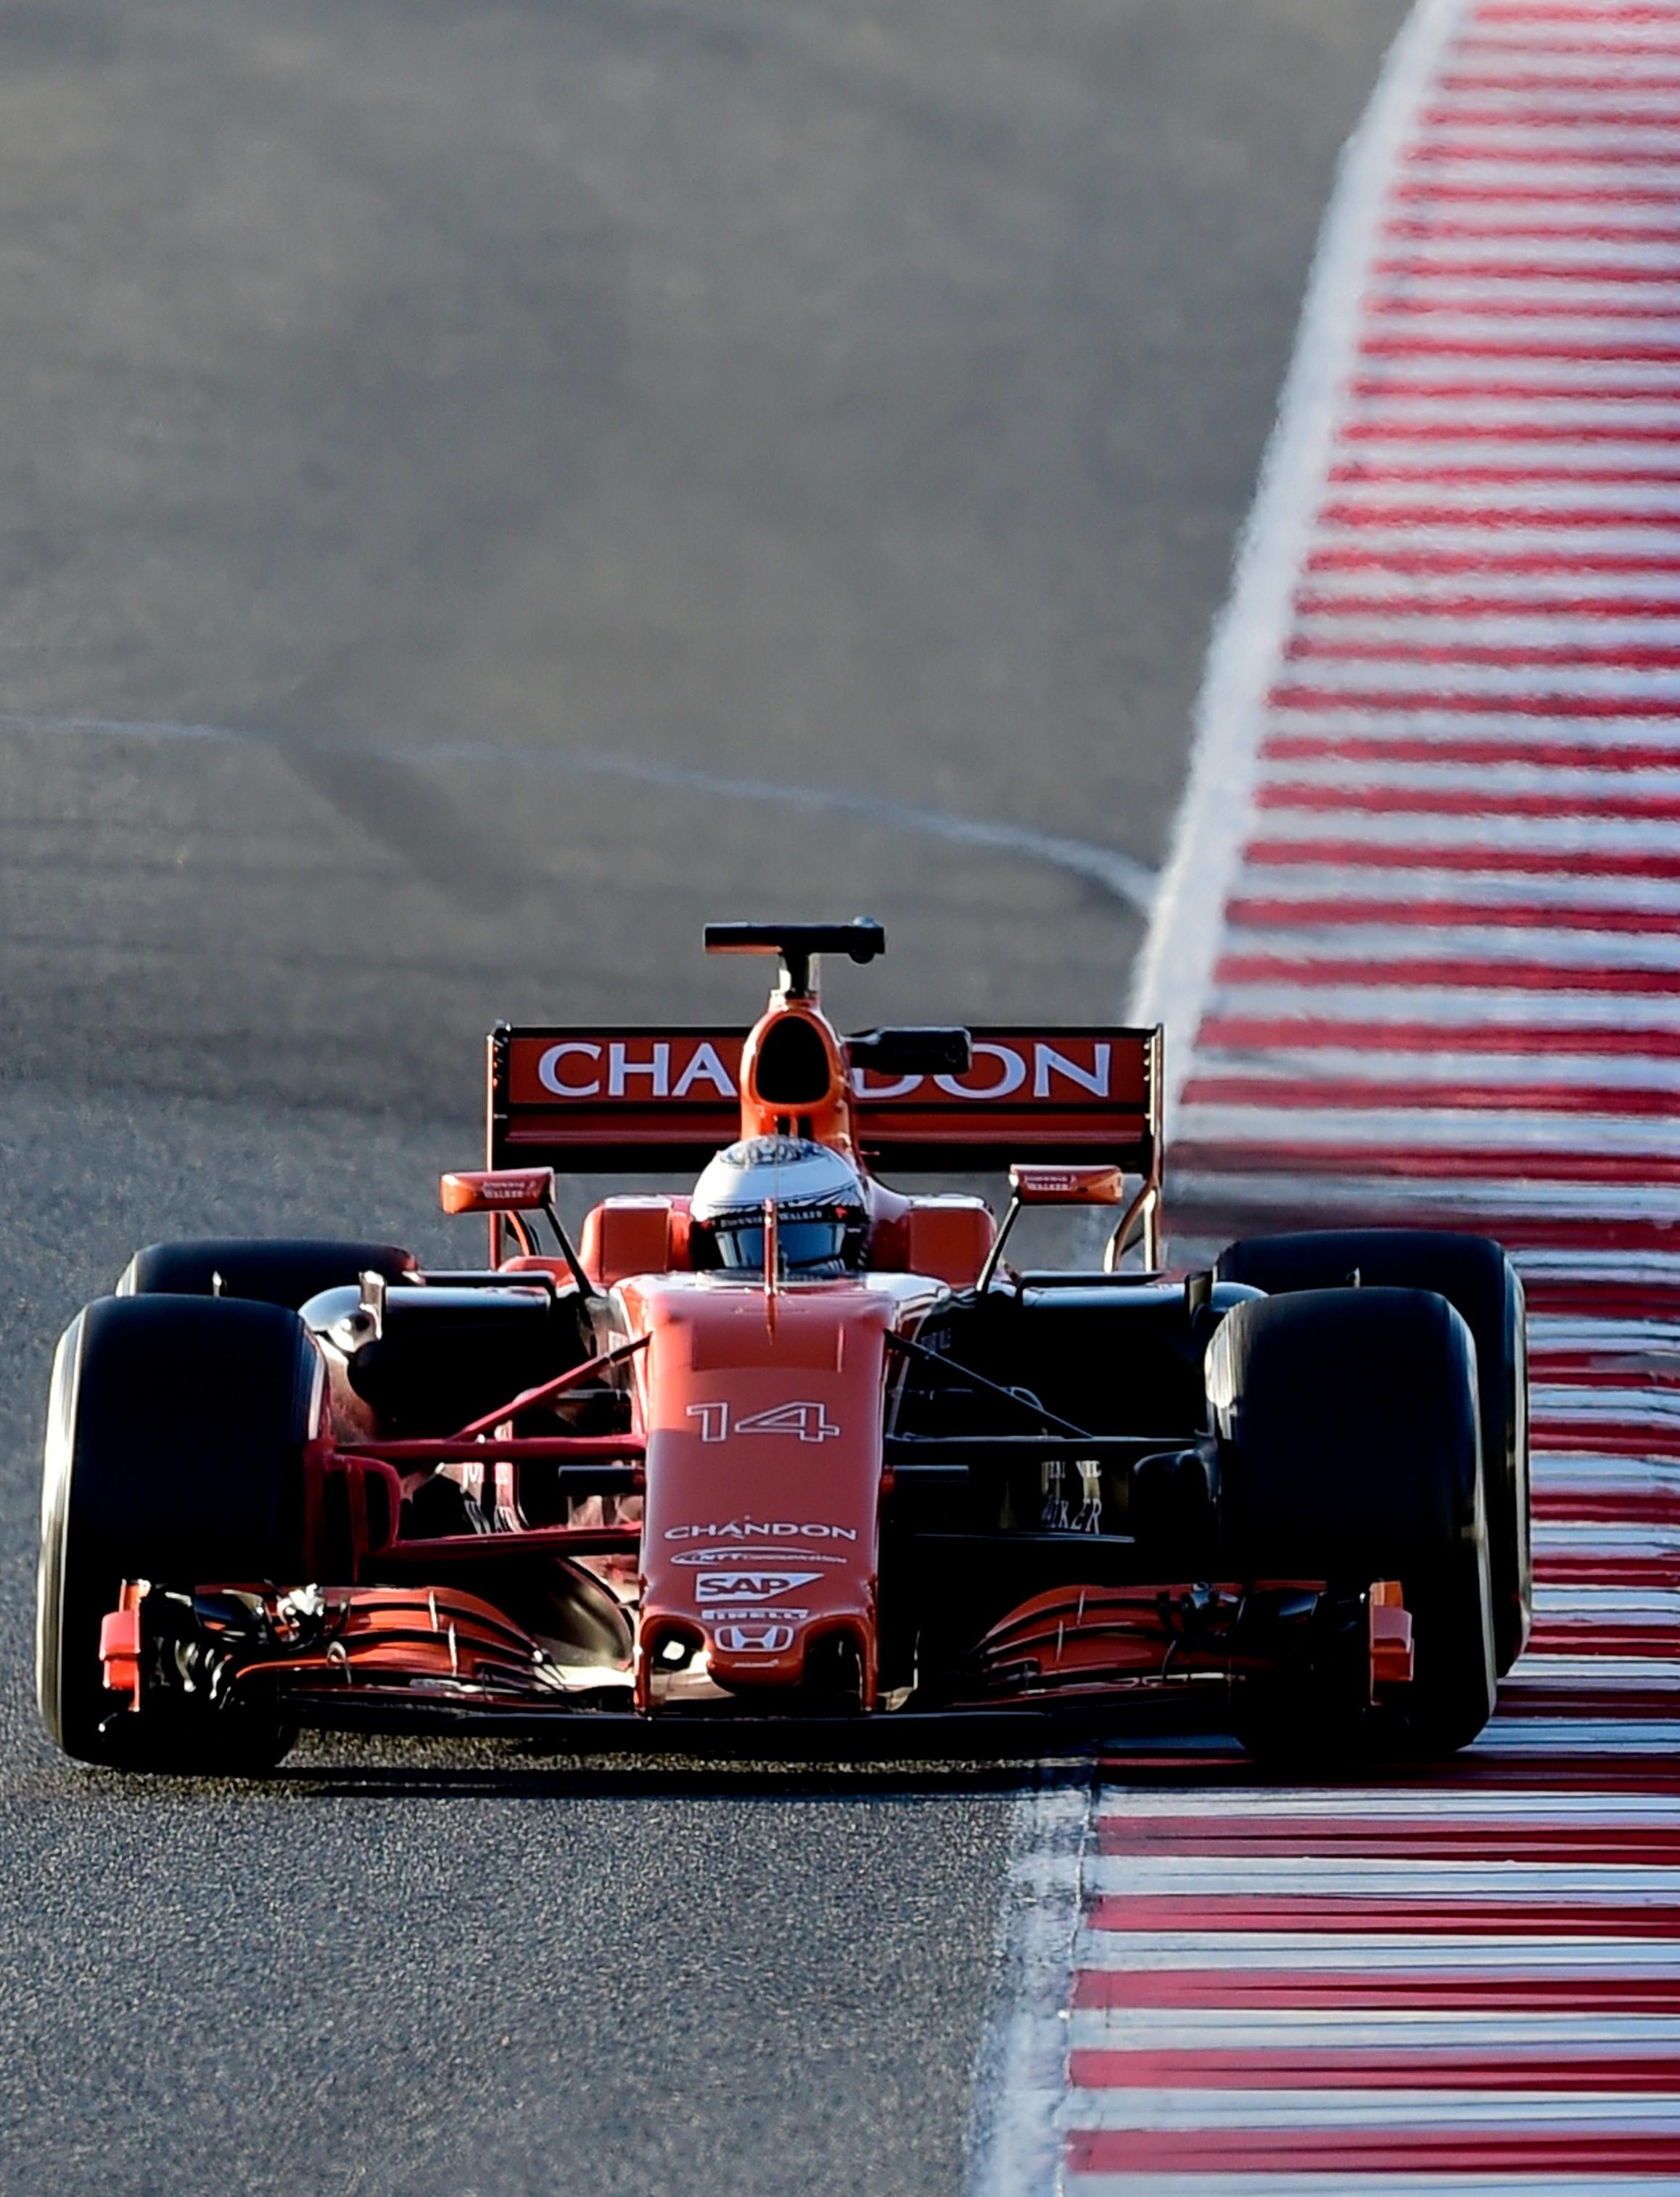 Fernando Alonso (McLaren) - Tests Montmelo 2 2017